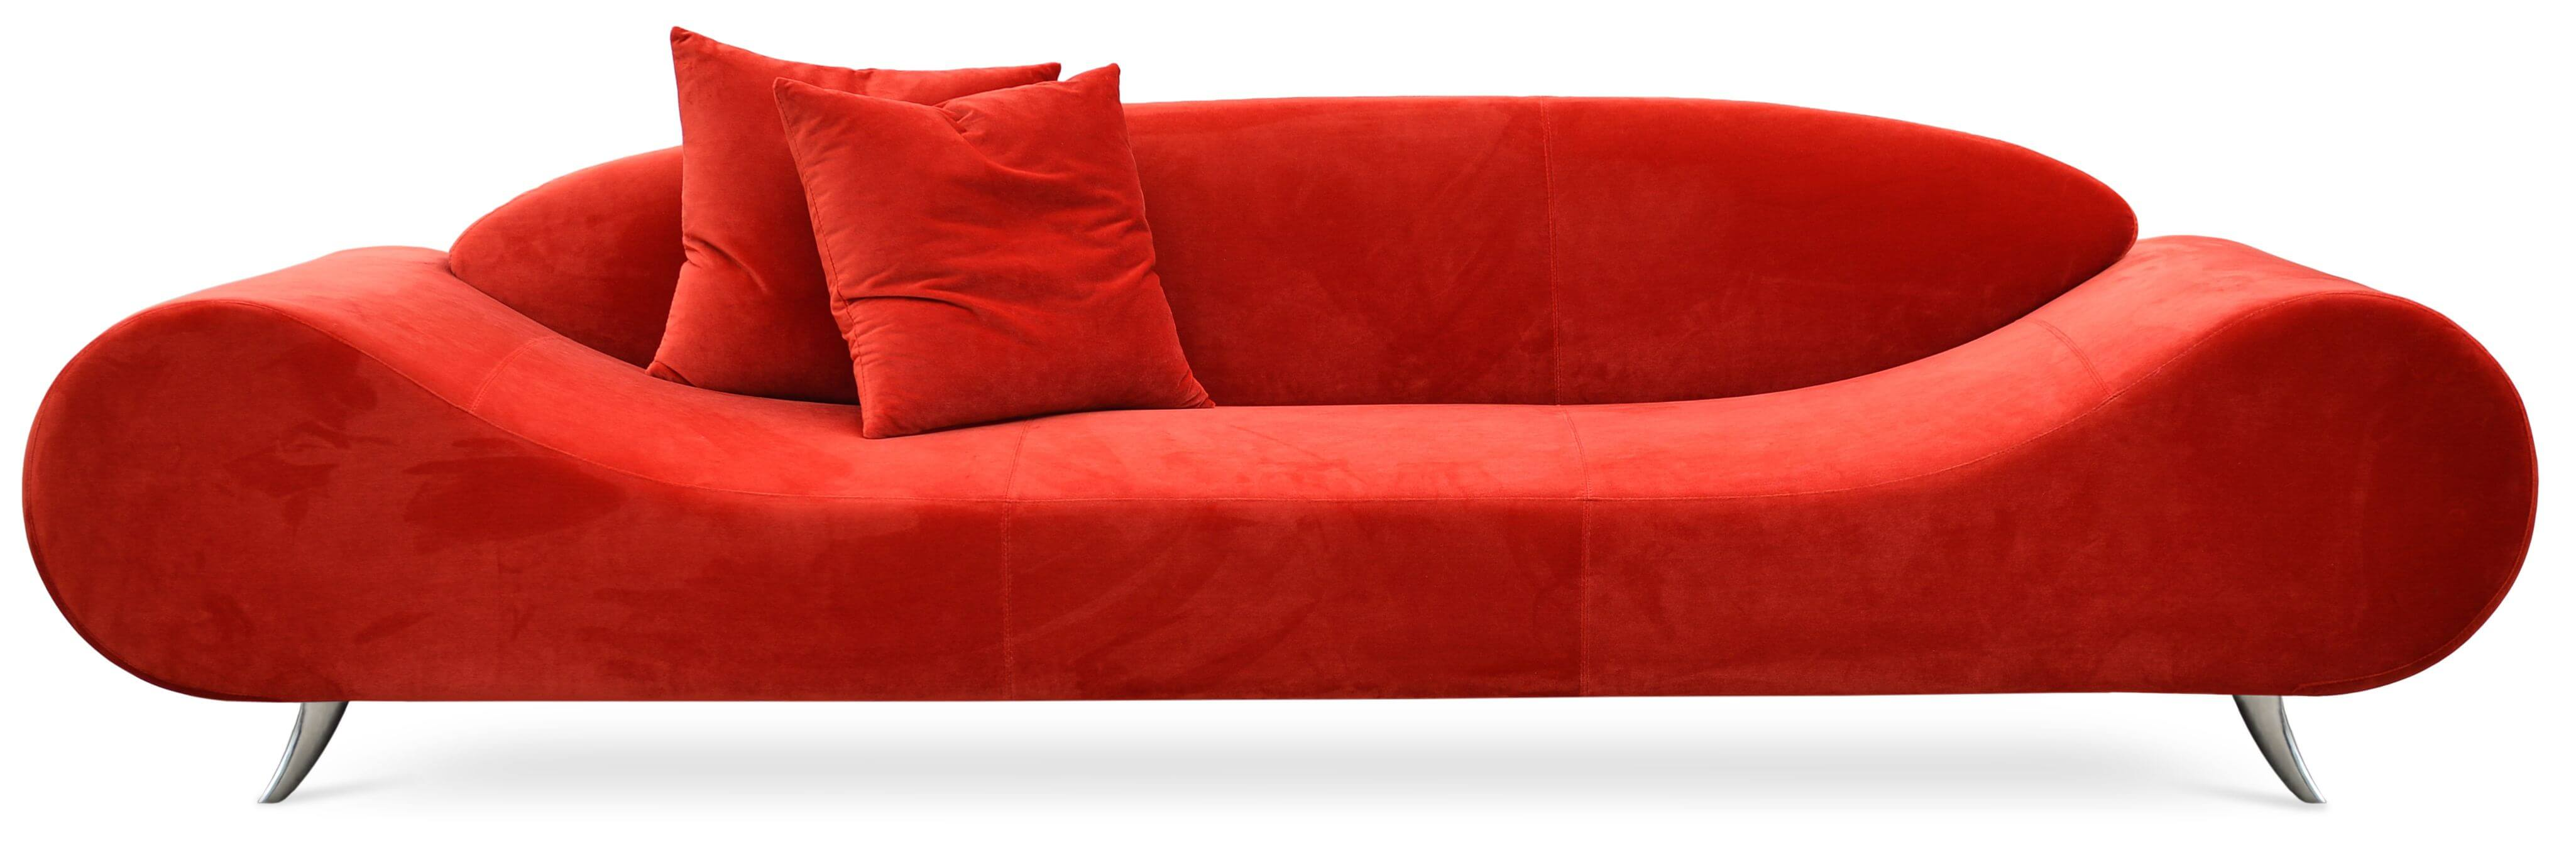 Harmony Sofa Orange Tweed Buy line at Best Price SohoMod